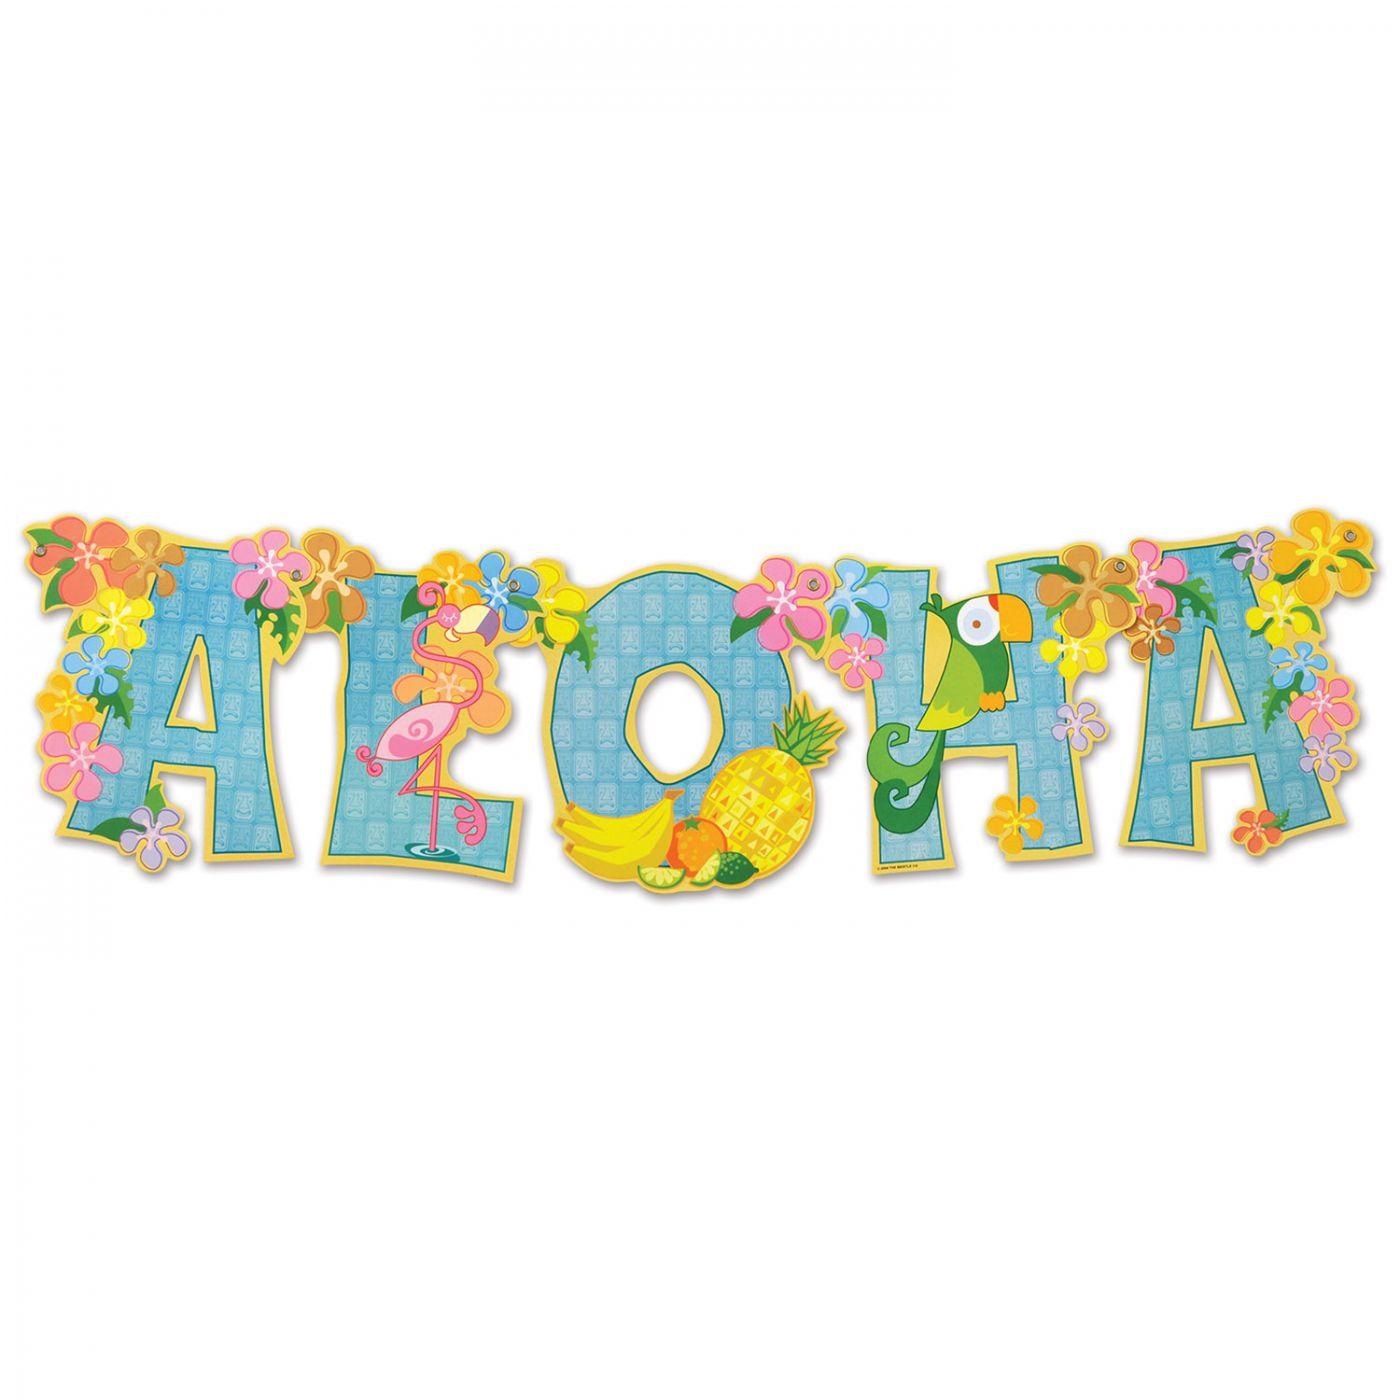 Aloha Streamer image